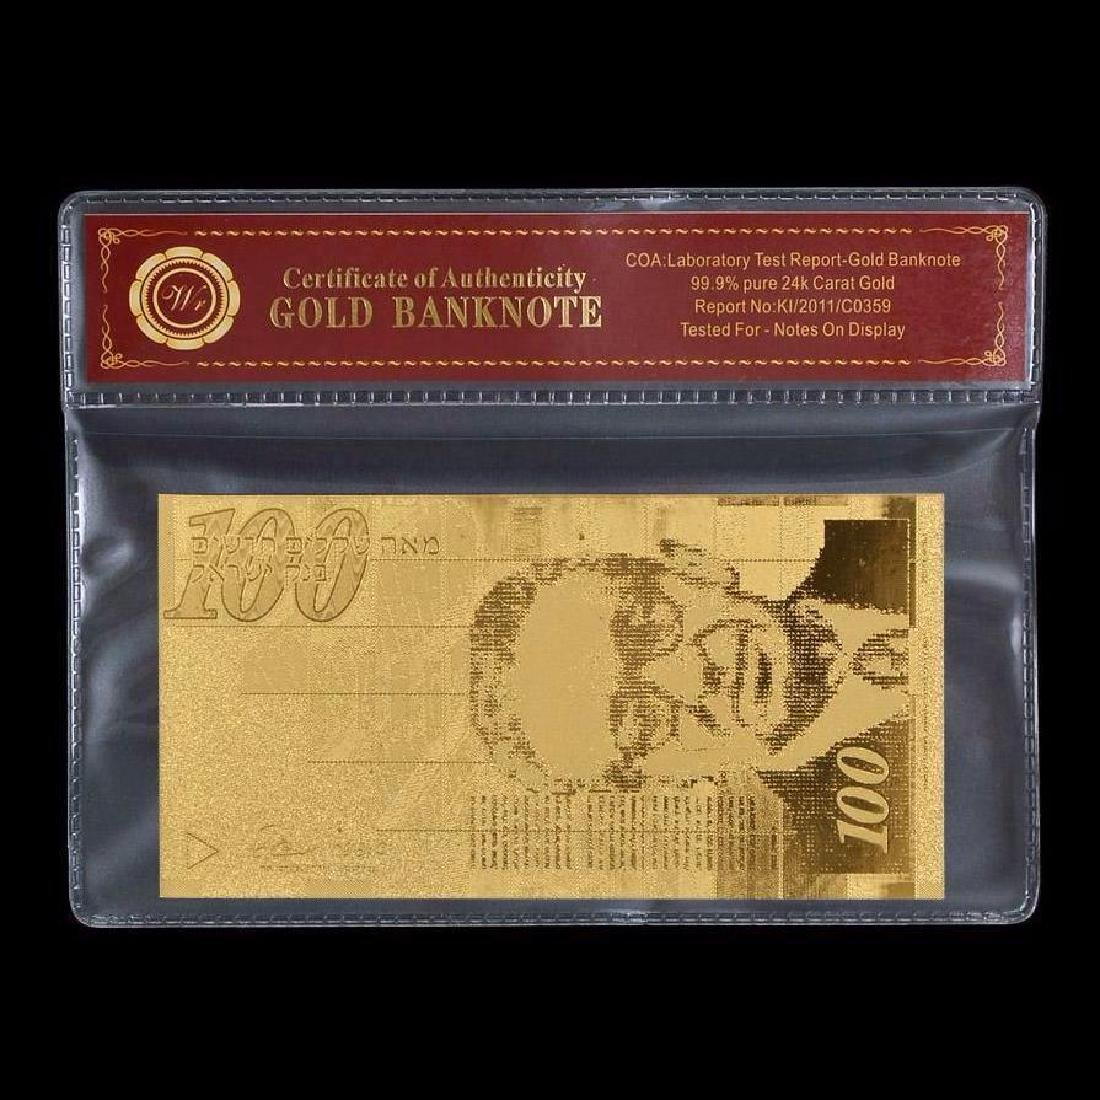 Israel 100 Shekels 24K Gold Clad Banknote